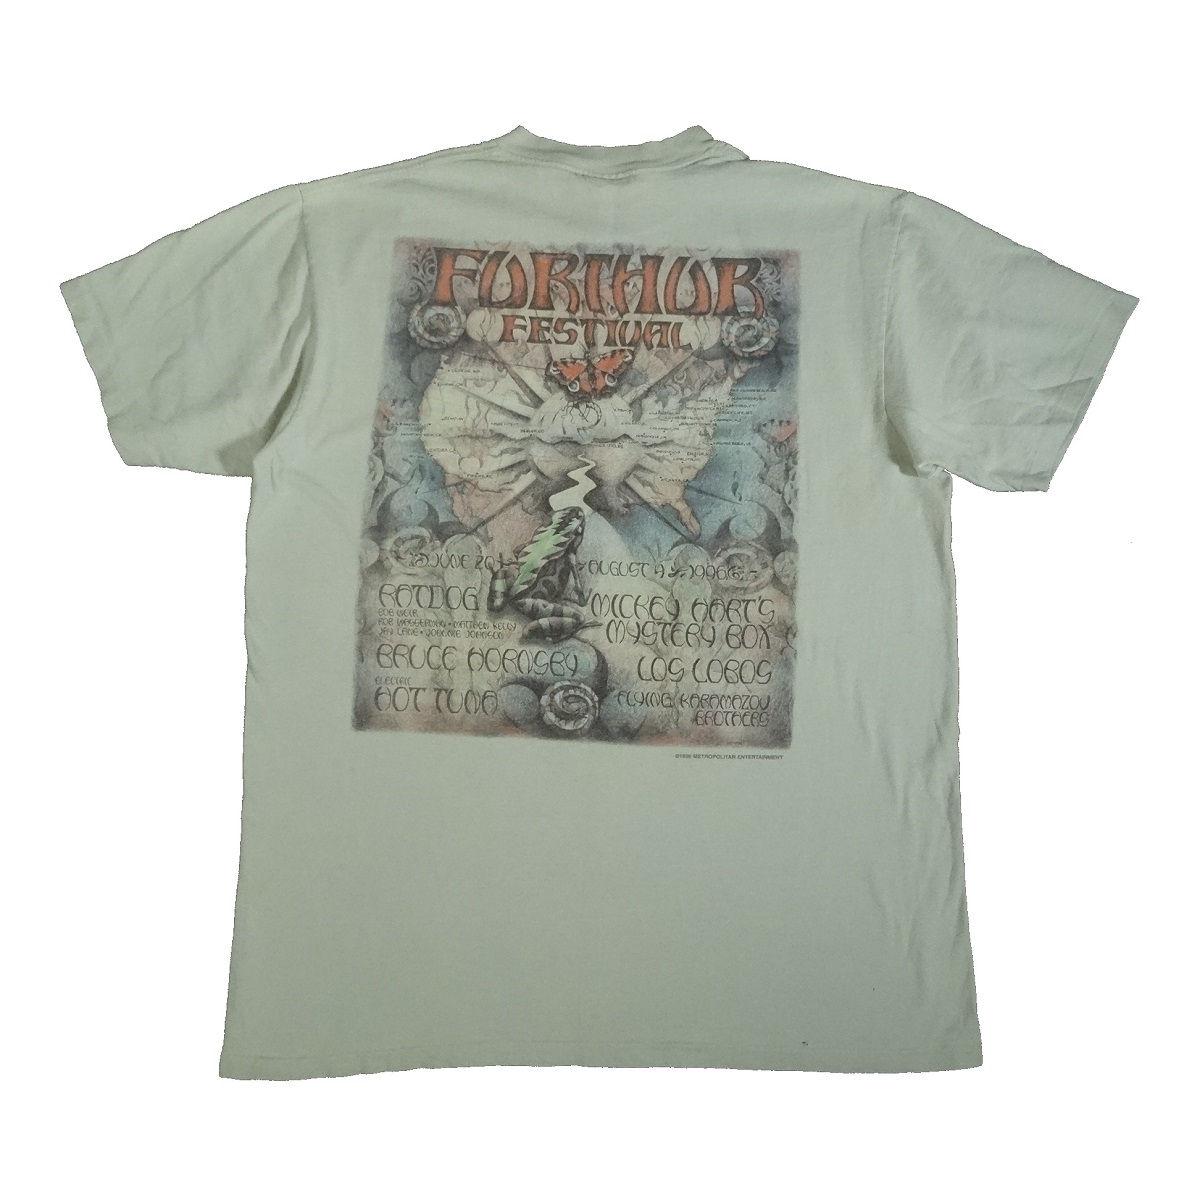 furthur festival 1996 t shirt grateful dead back